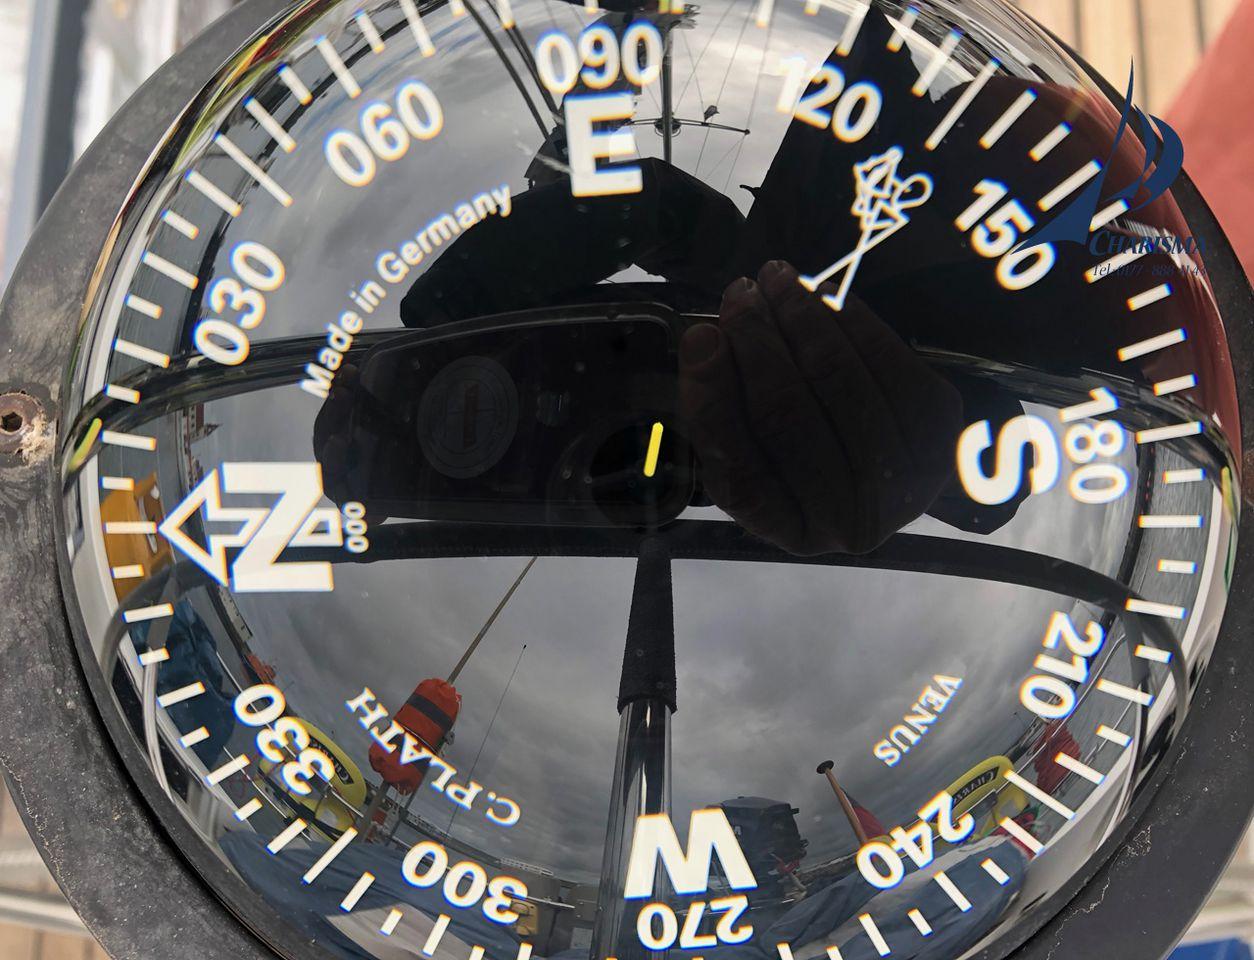 Kompass der SY Charisma